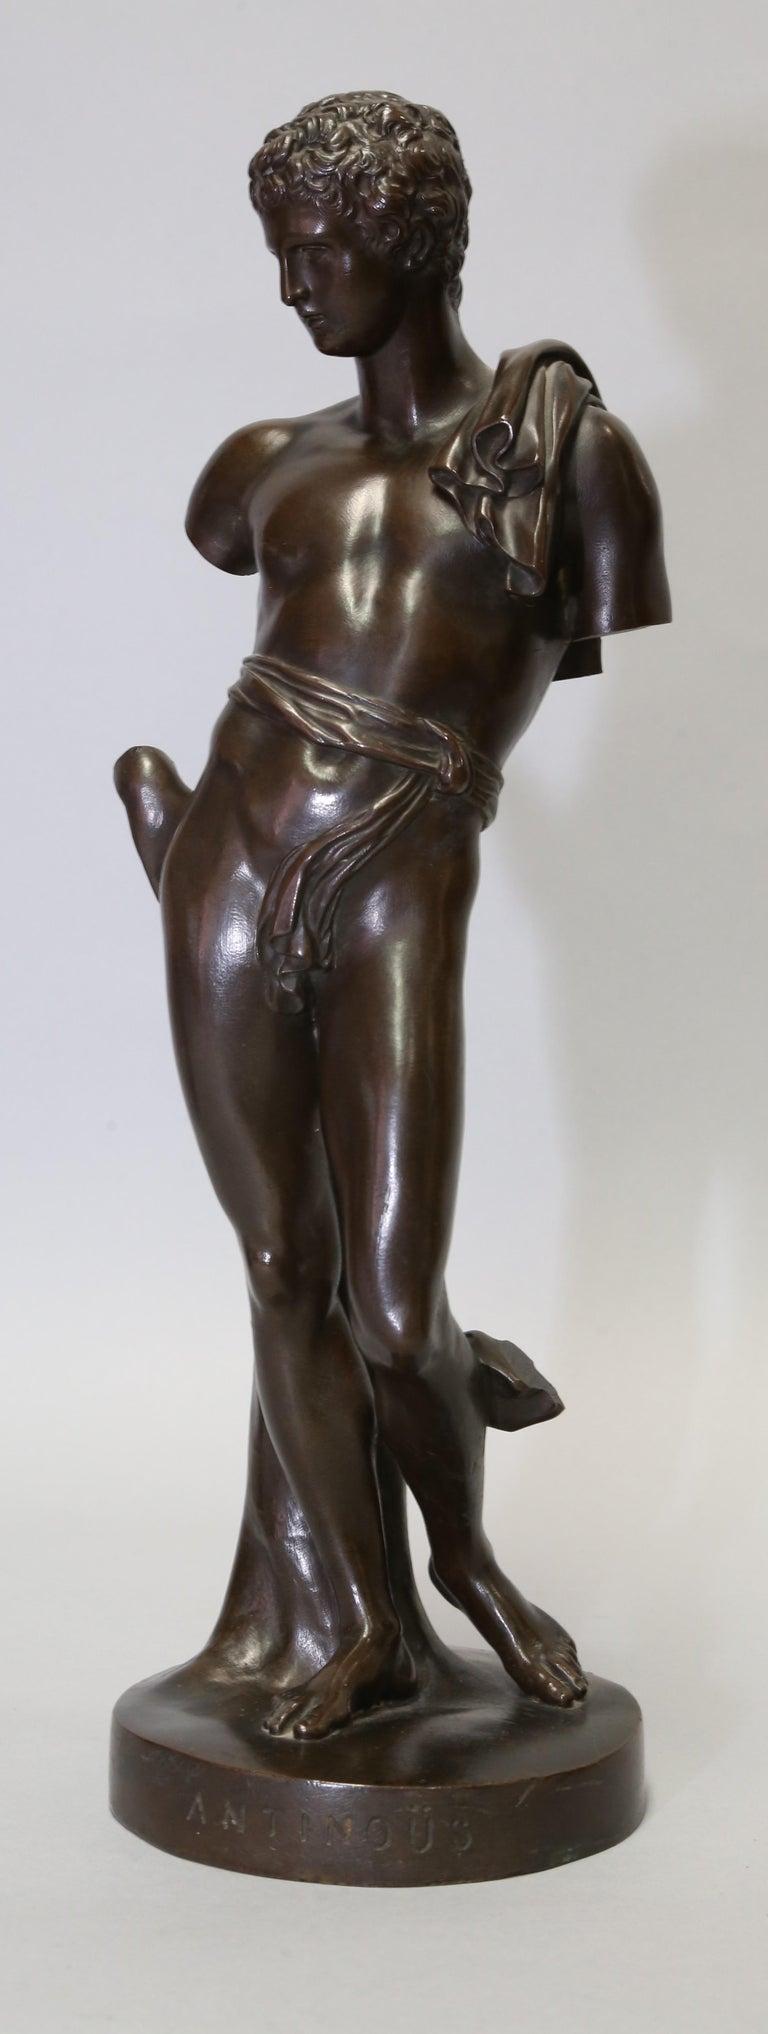 Antique Bronze Sculpture of Antinous of Belvedere, 19th Century, Italian For Sale 7